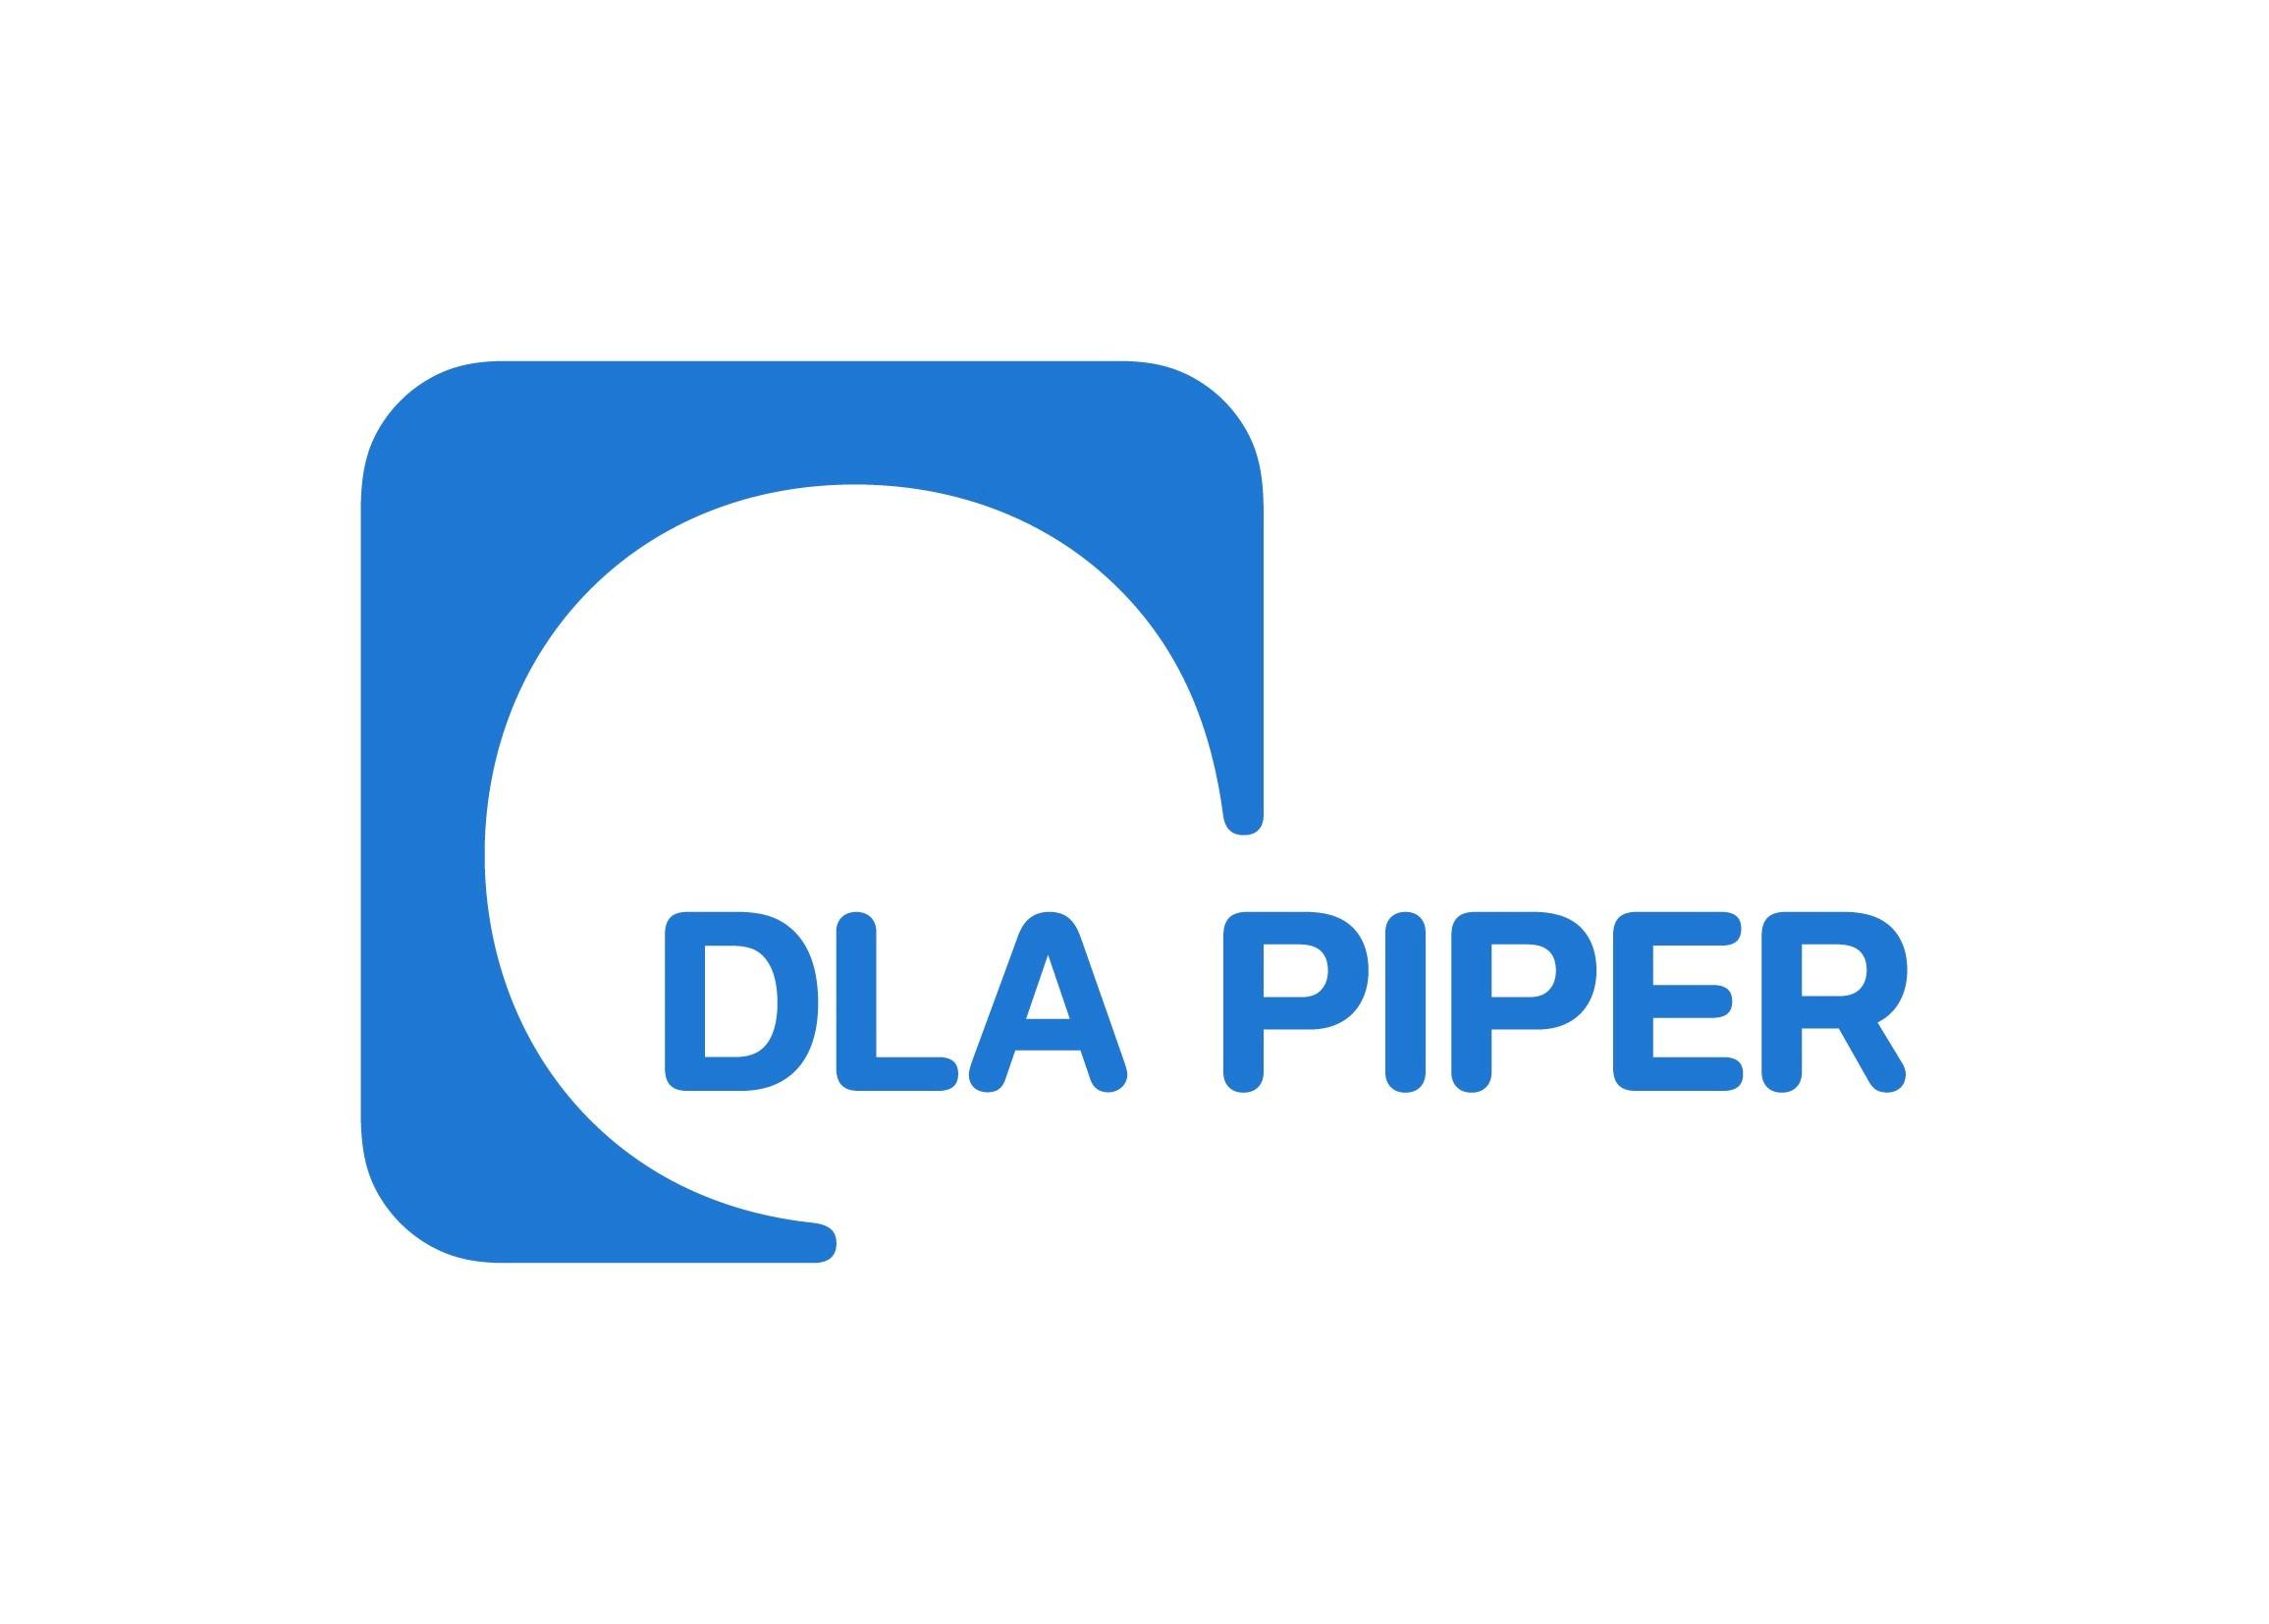 DLA_Piper Lgo_JPG.JPG